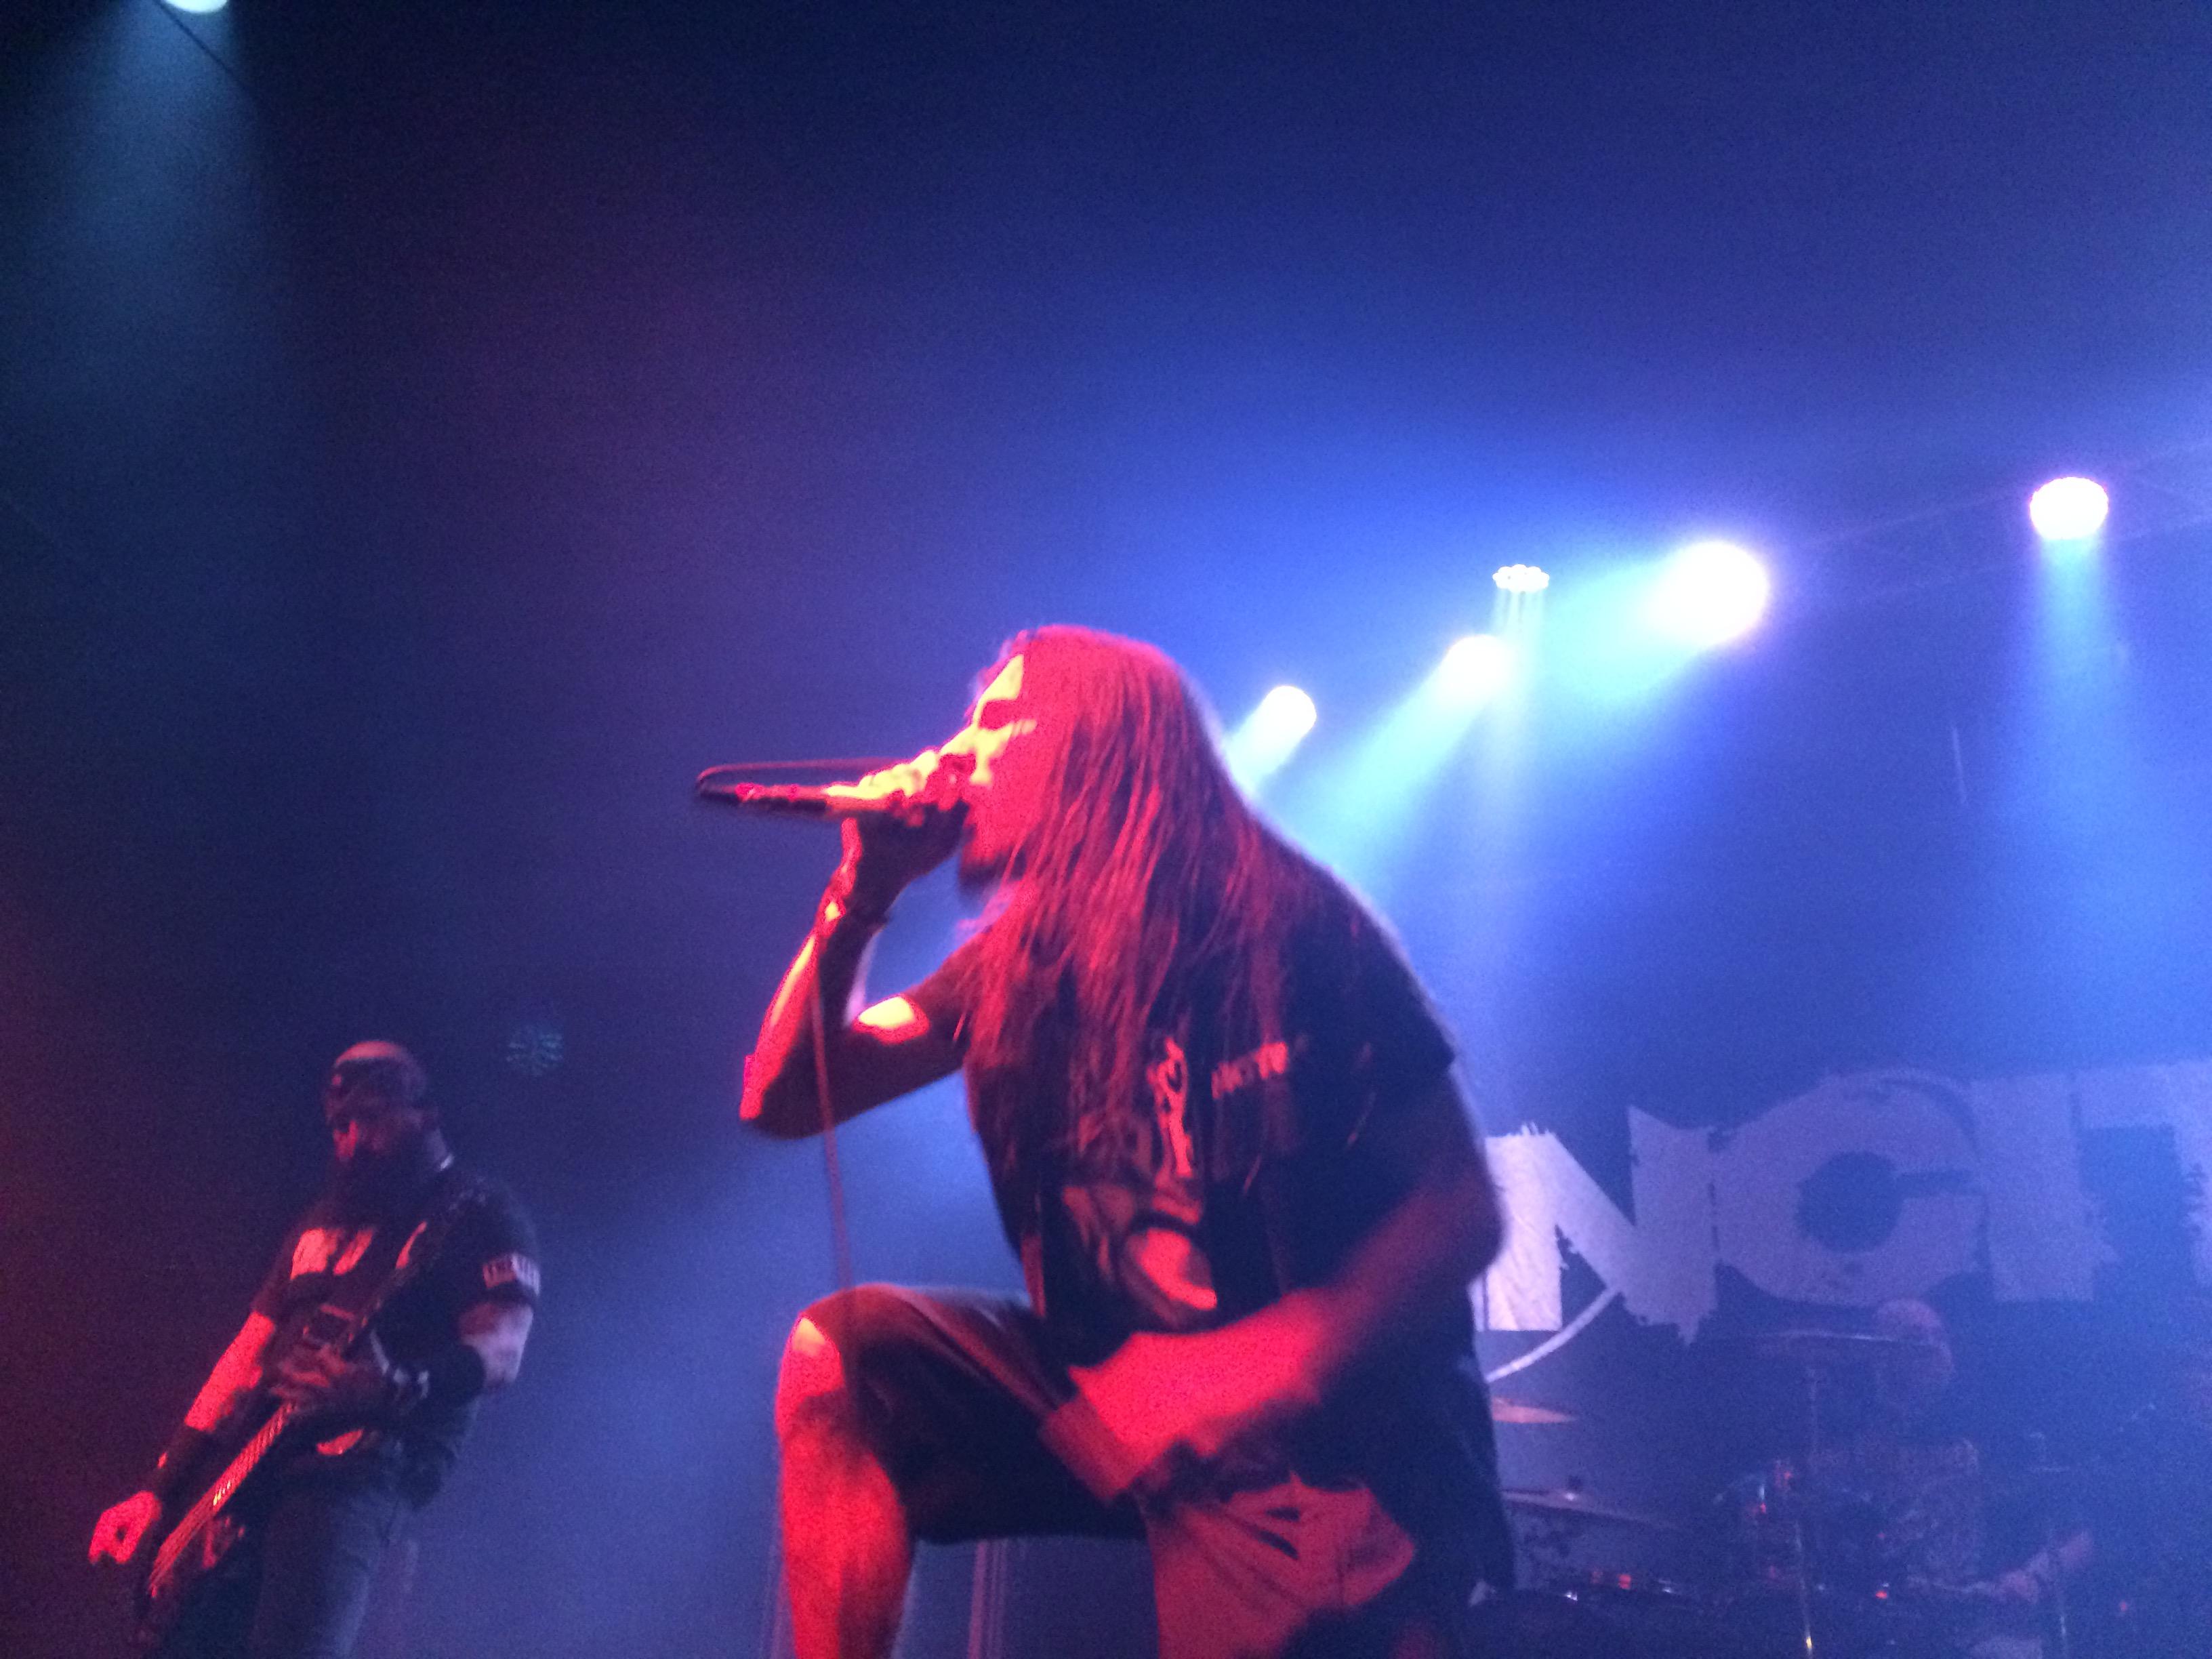 Live Picture of Richie Cavalera of Incite at Club red 4/17/15